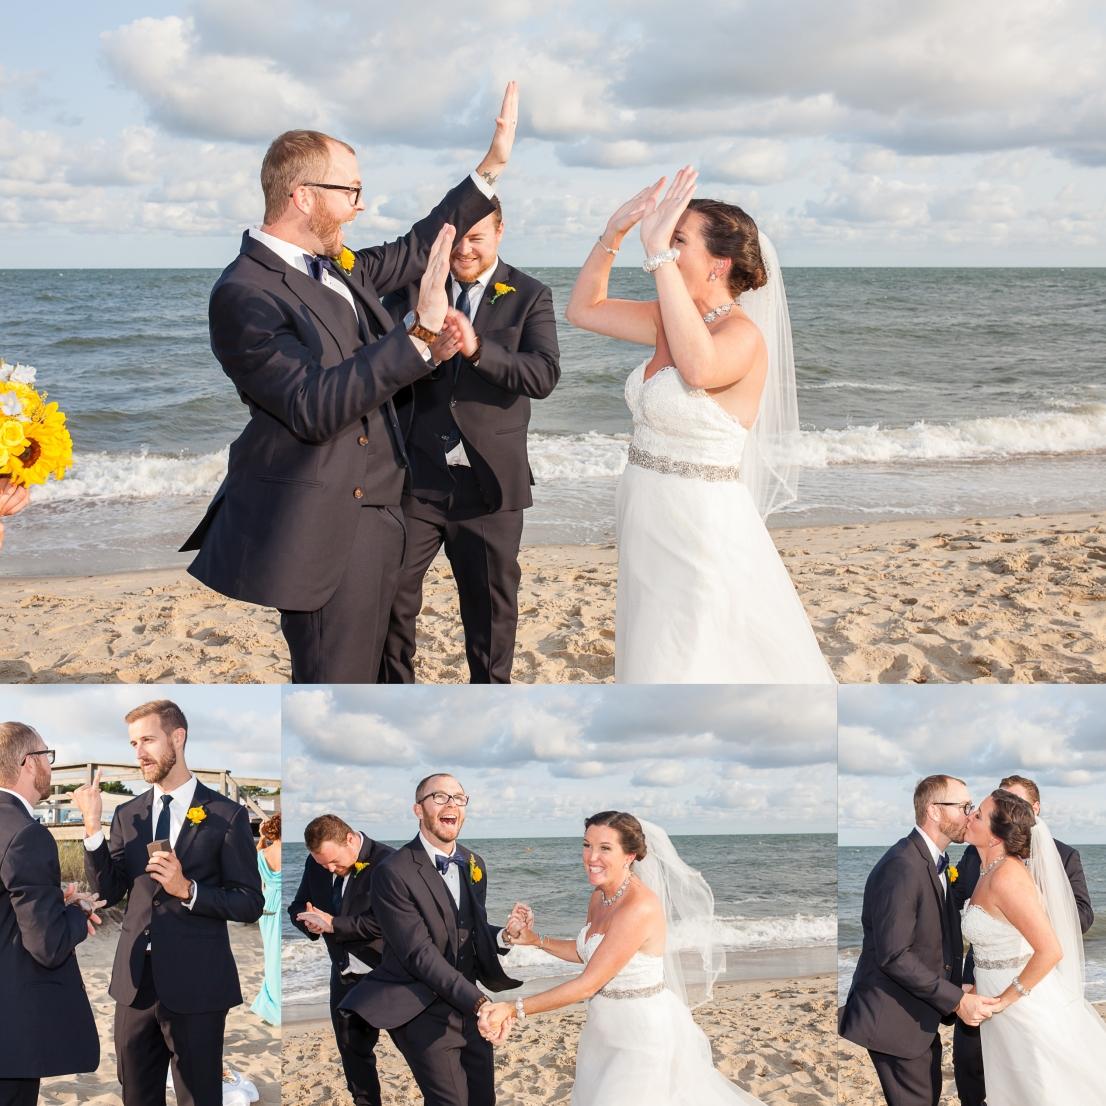 cape-cod-wedding-photographer-lisa-elizabeth-images-21-of-29